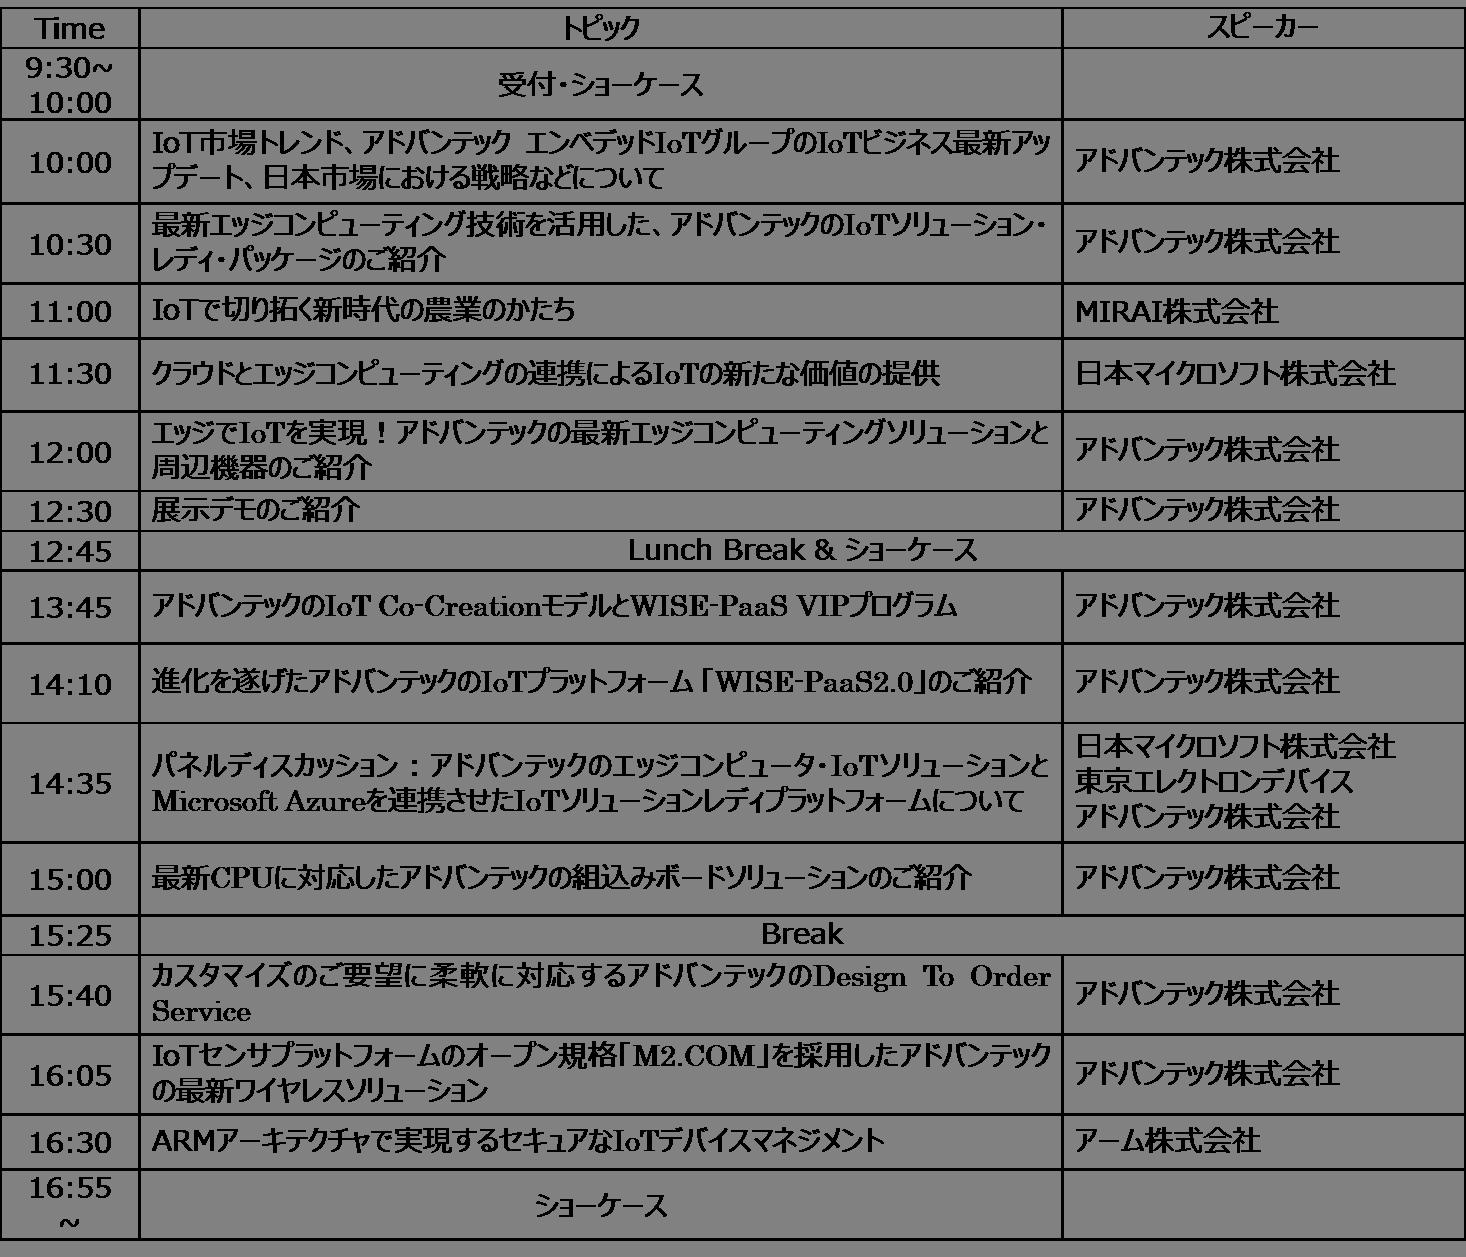 ADF2018 Tokyo Program